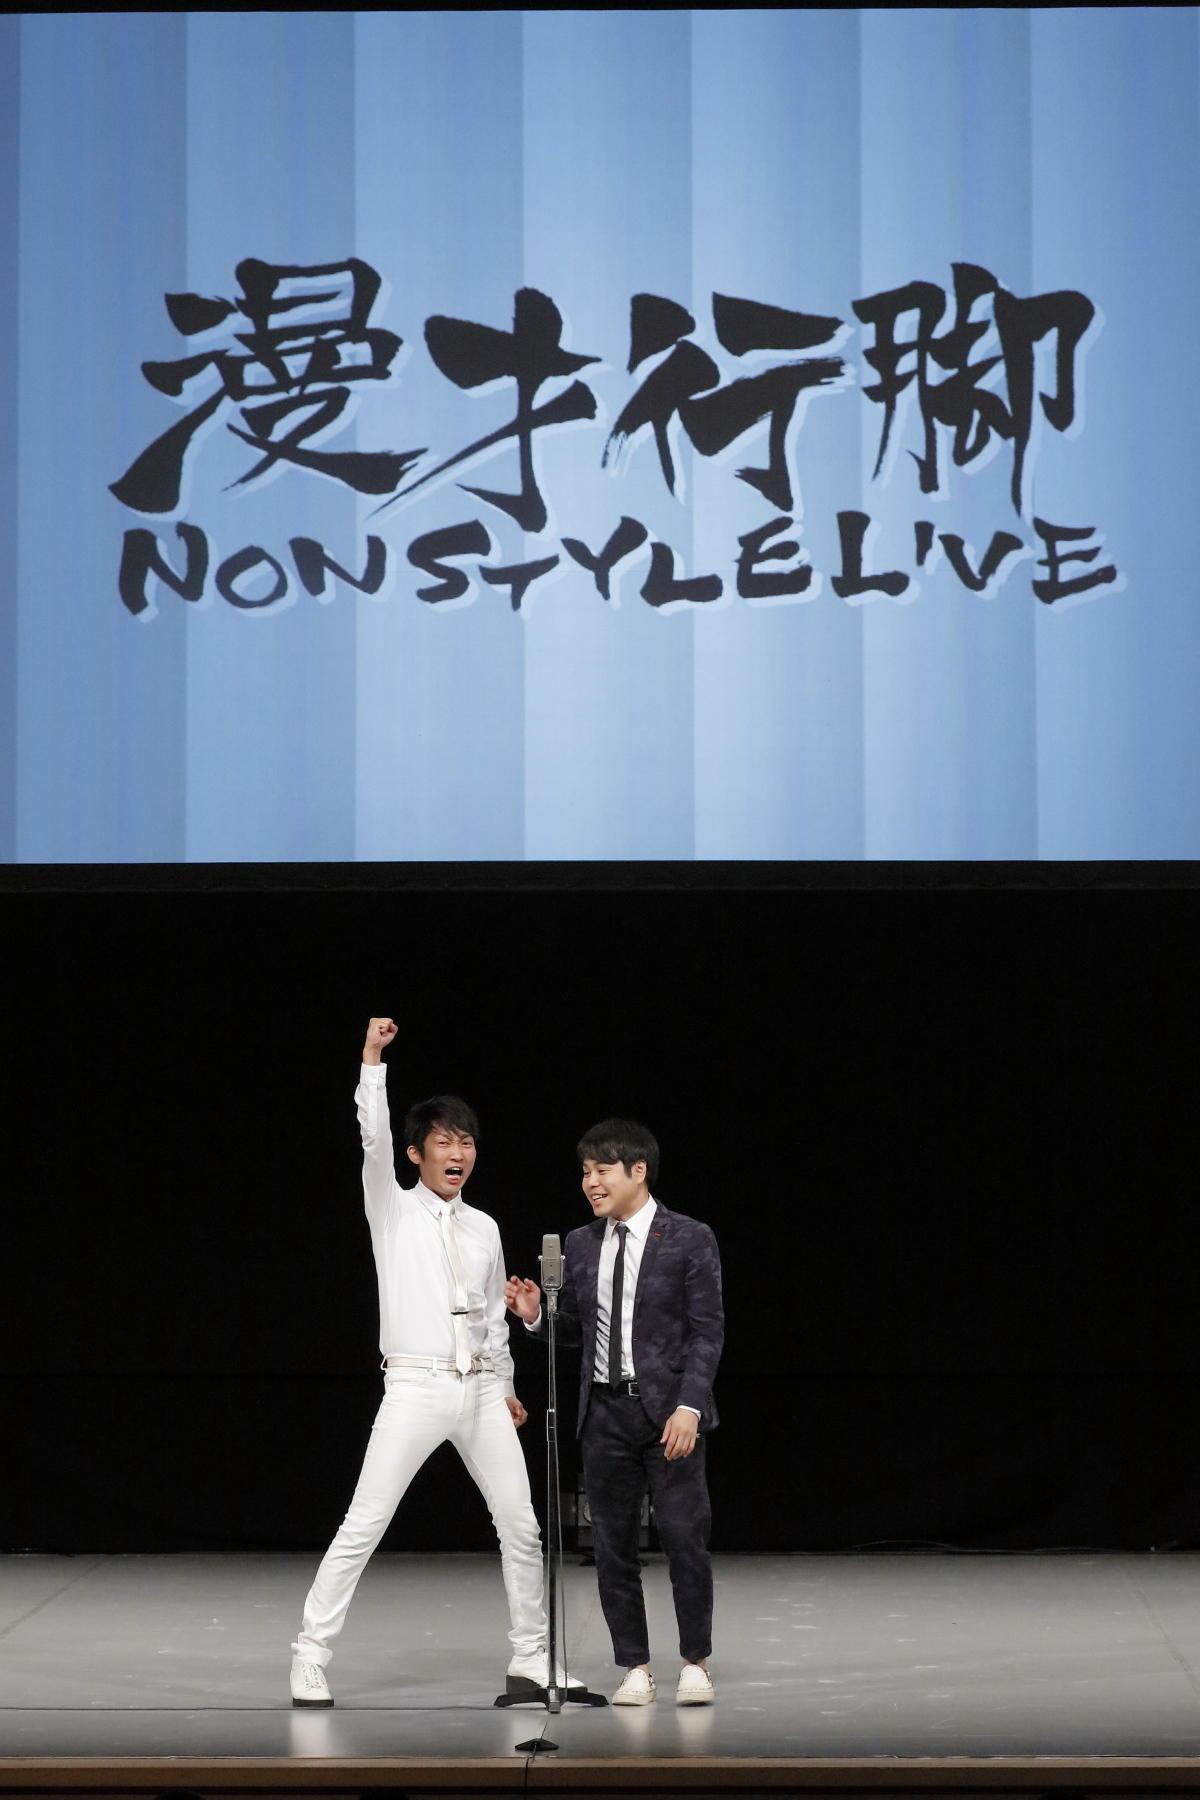 http://news.yoshimoto.co.jp/20171112123732-b06f5b81a11dfa7d54d58bed0afc1c58e525f643.jpg